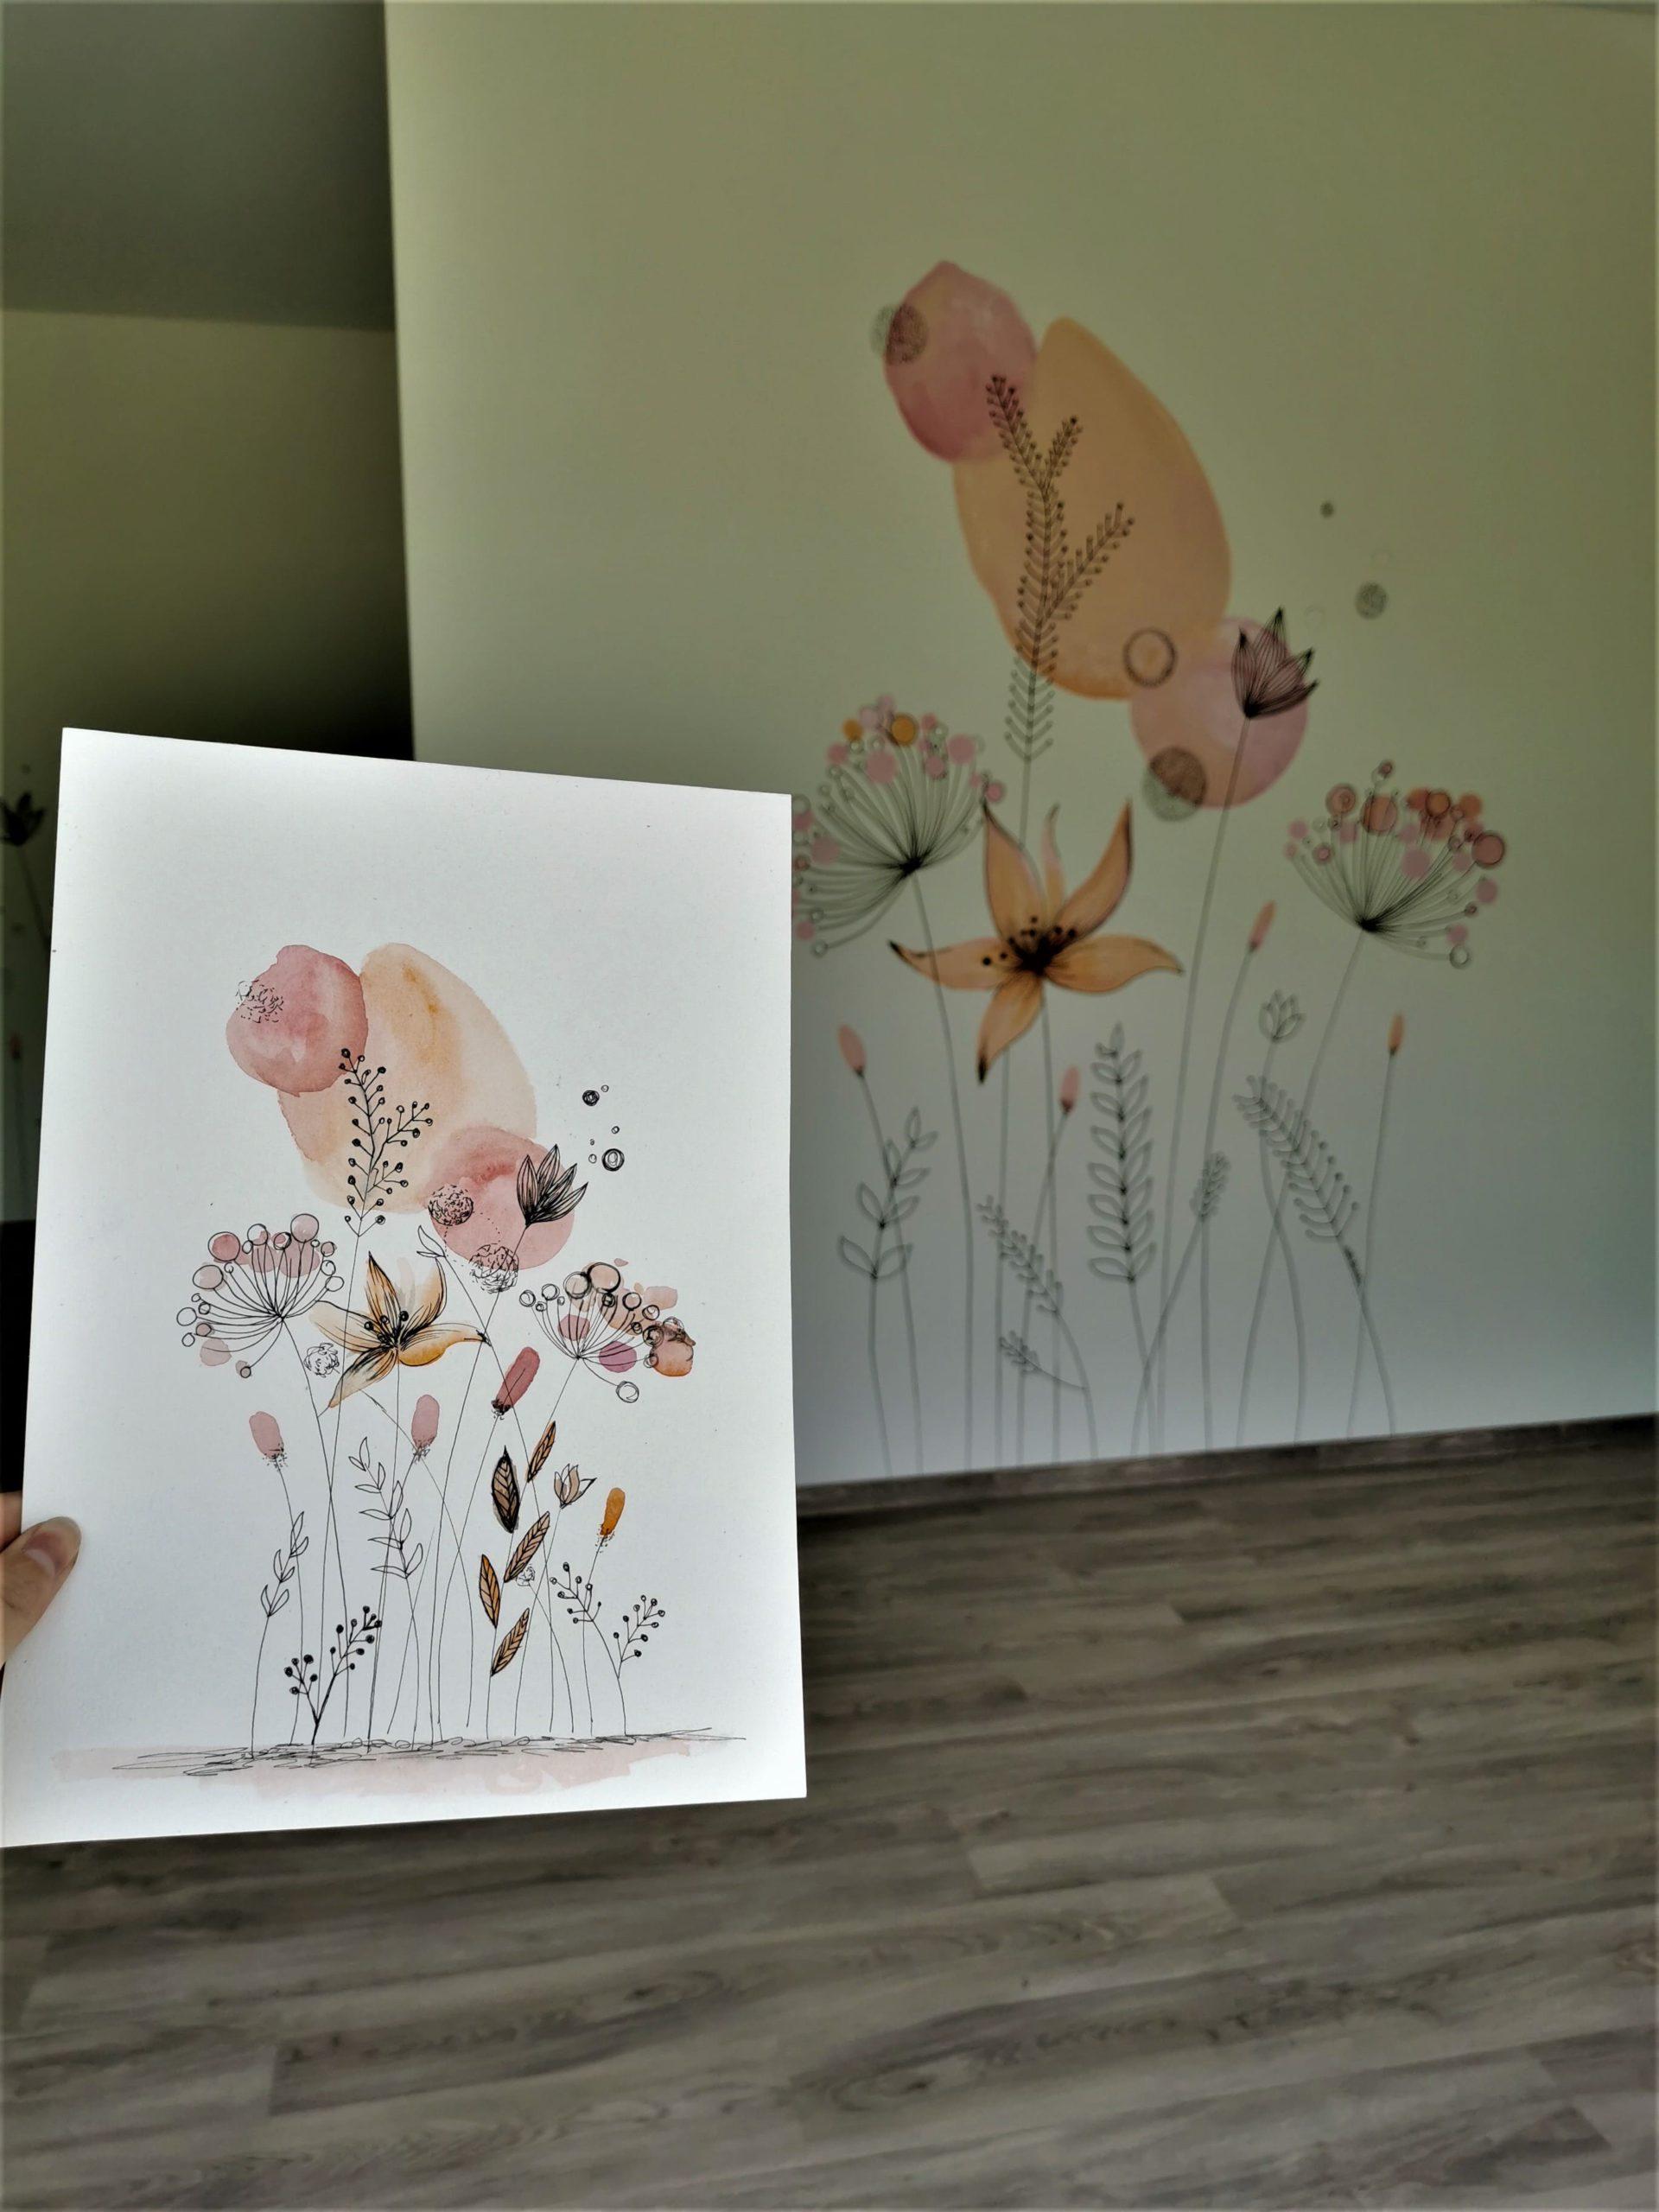 menine-kuryba-sienu-dekoravimas-ivairus-interjerai (22)